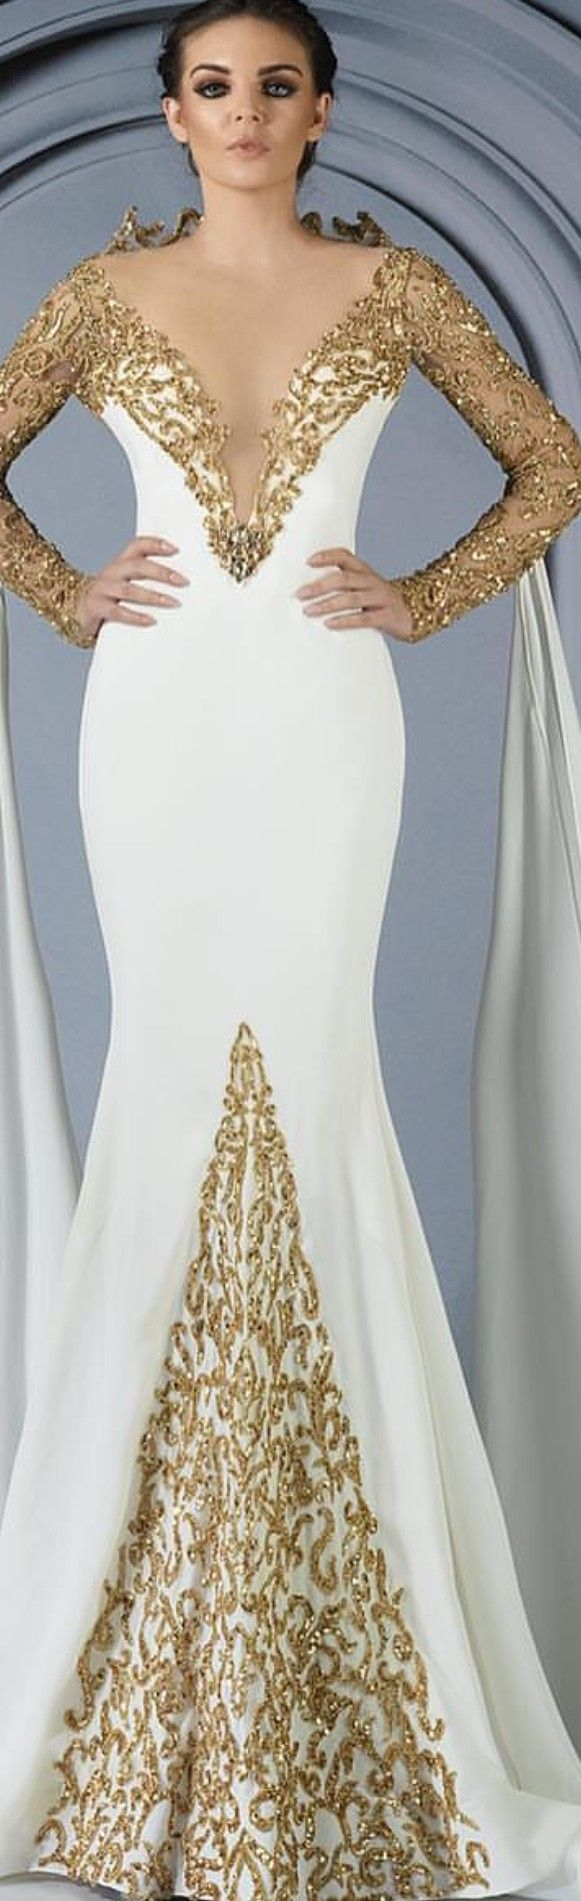 Marwan khaled wedding wizardry pinterest ball gown